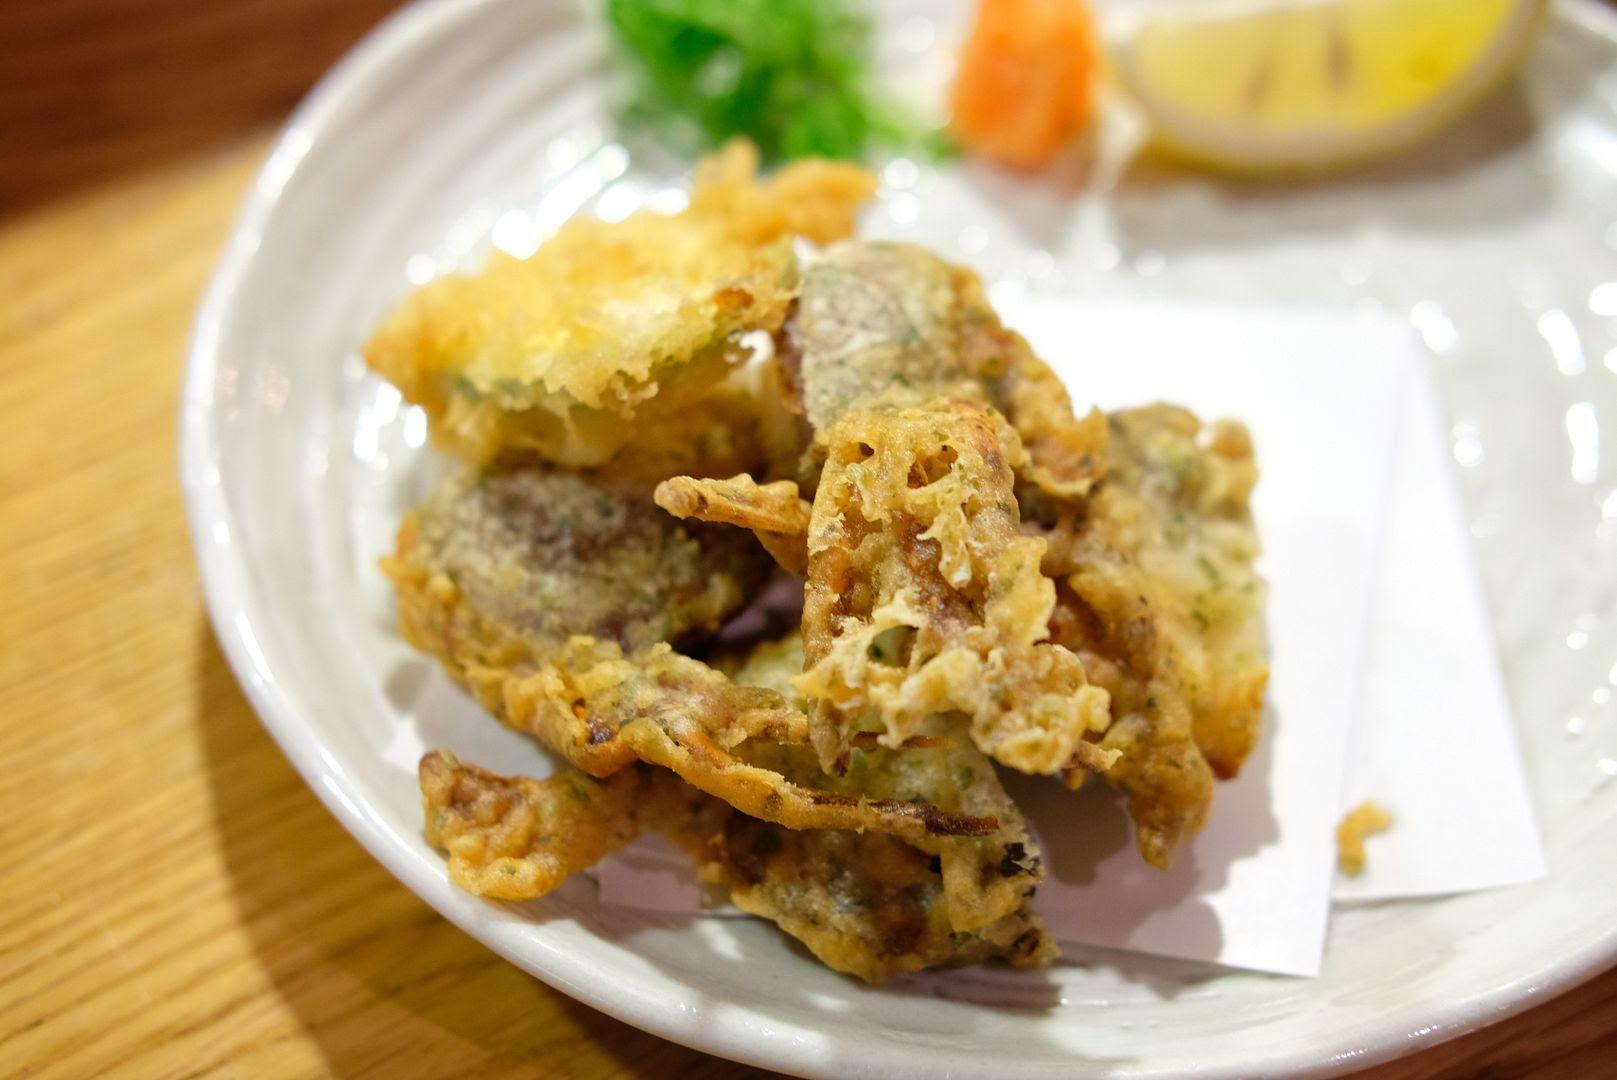 photo komeyui japanese restaurant port melbourne.jpg